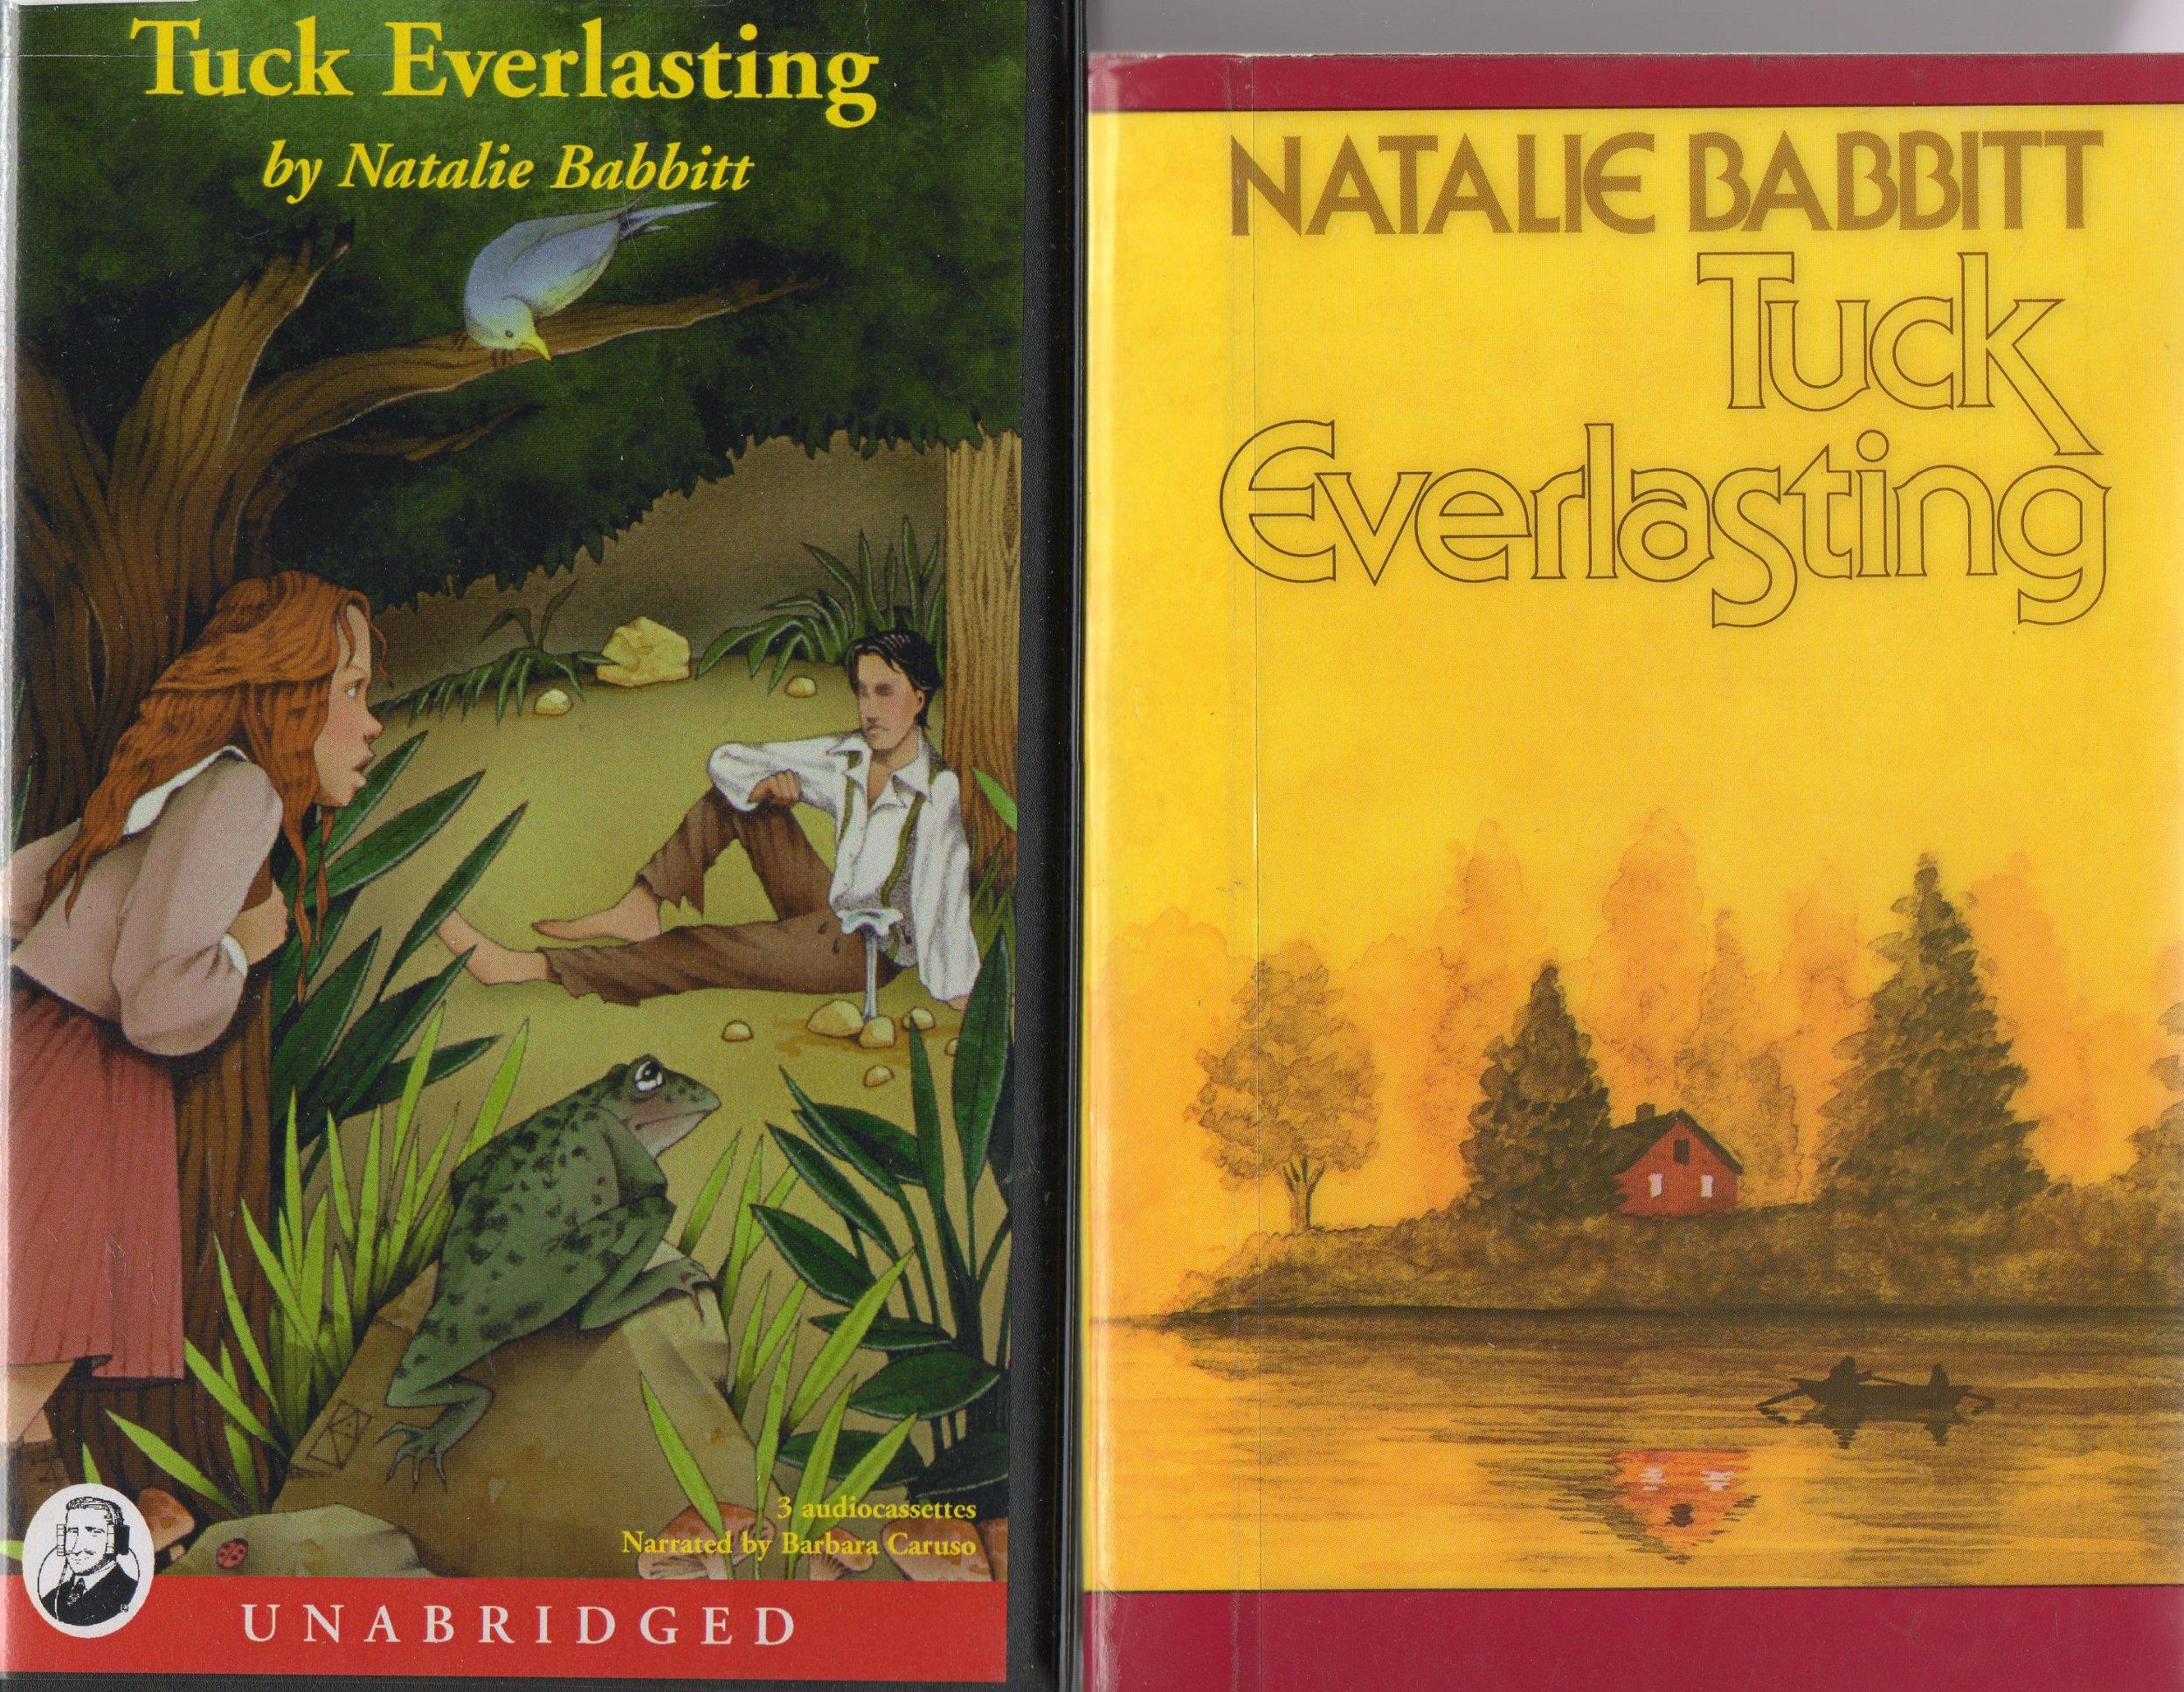 TUCK EVERLASTING BOOK PDF DOWNLOAD